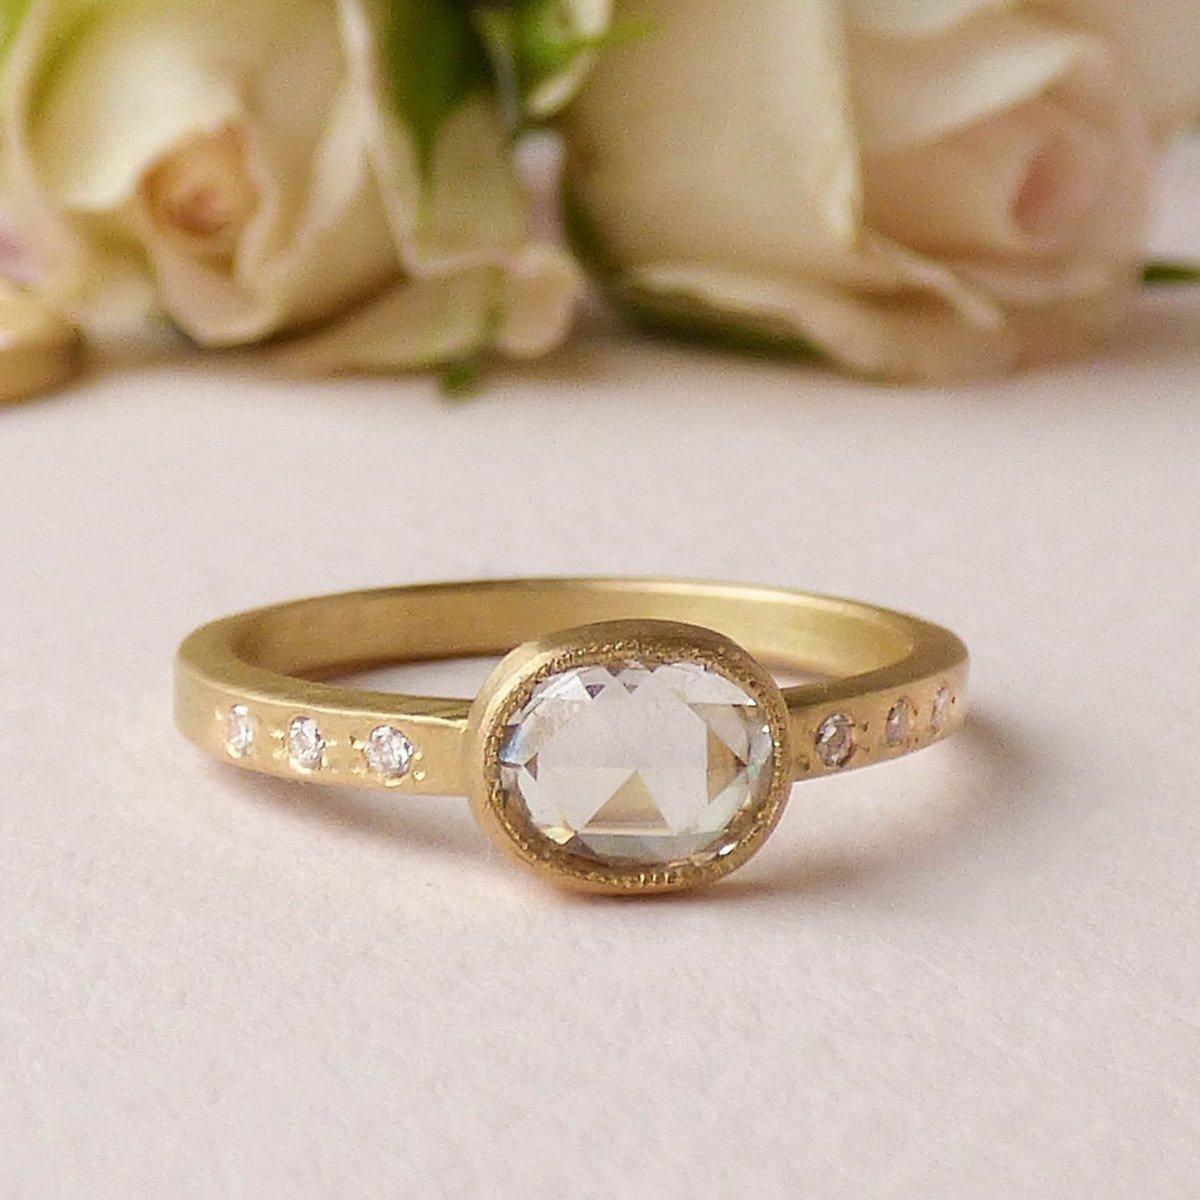 Wedding Rings For Her